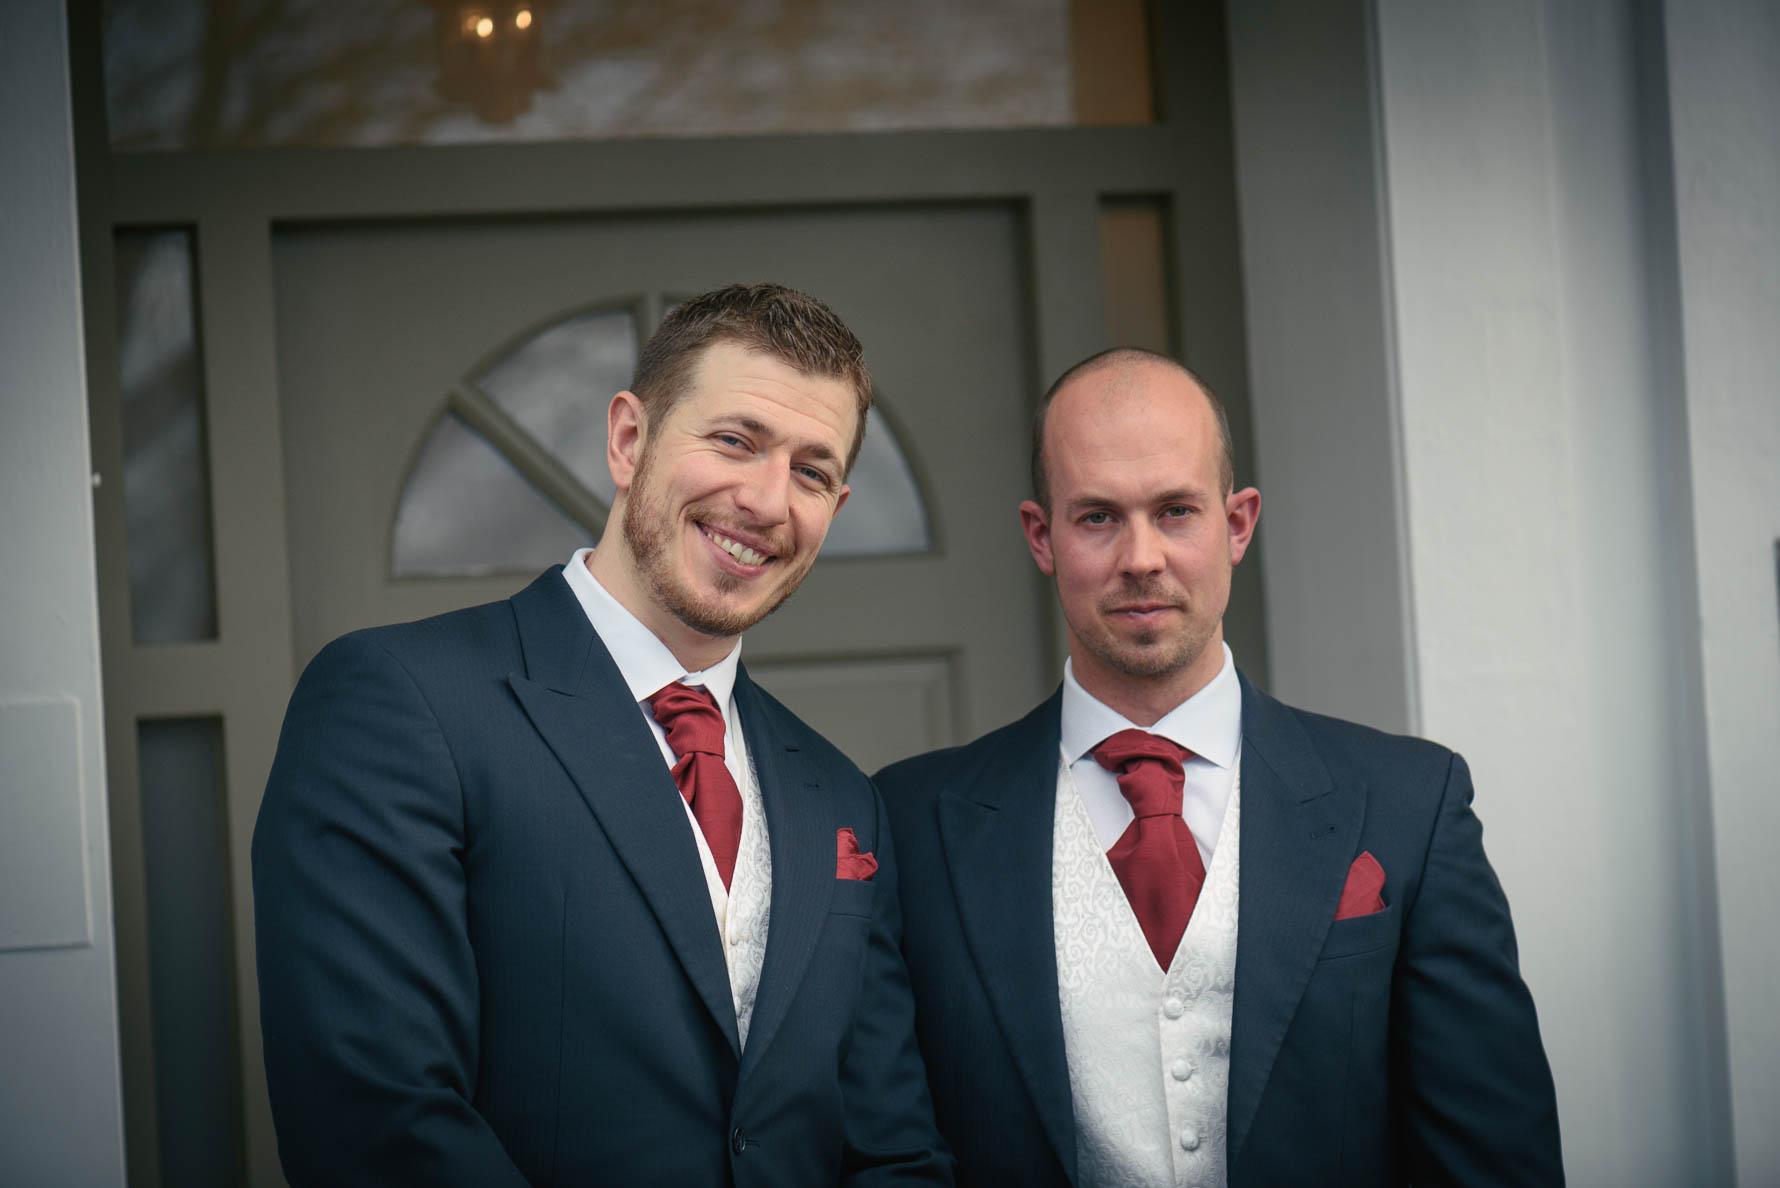 Groom and Best Man at Hadlow Manor wedding venue